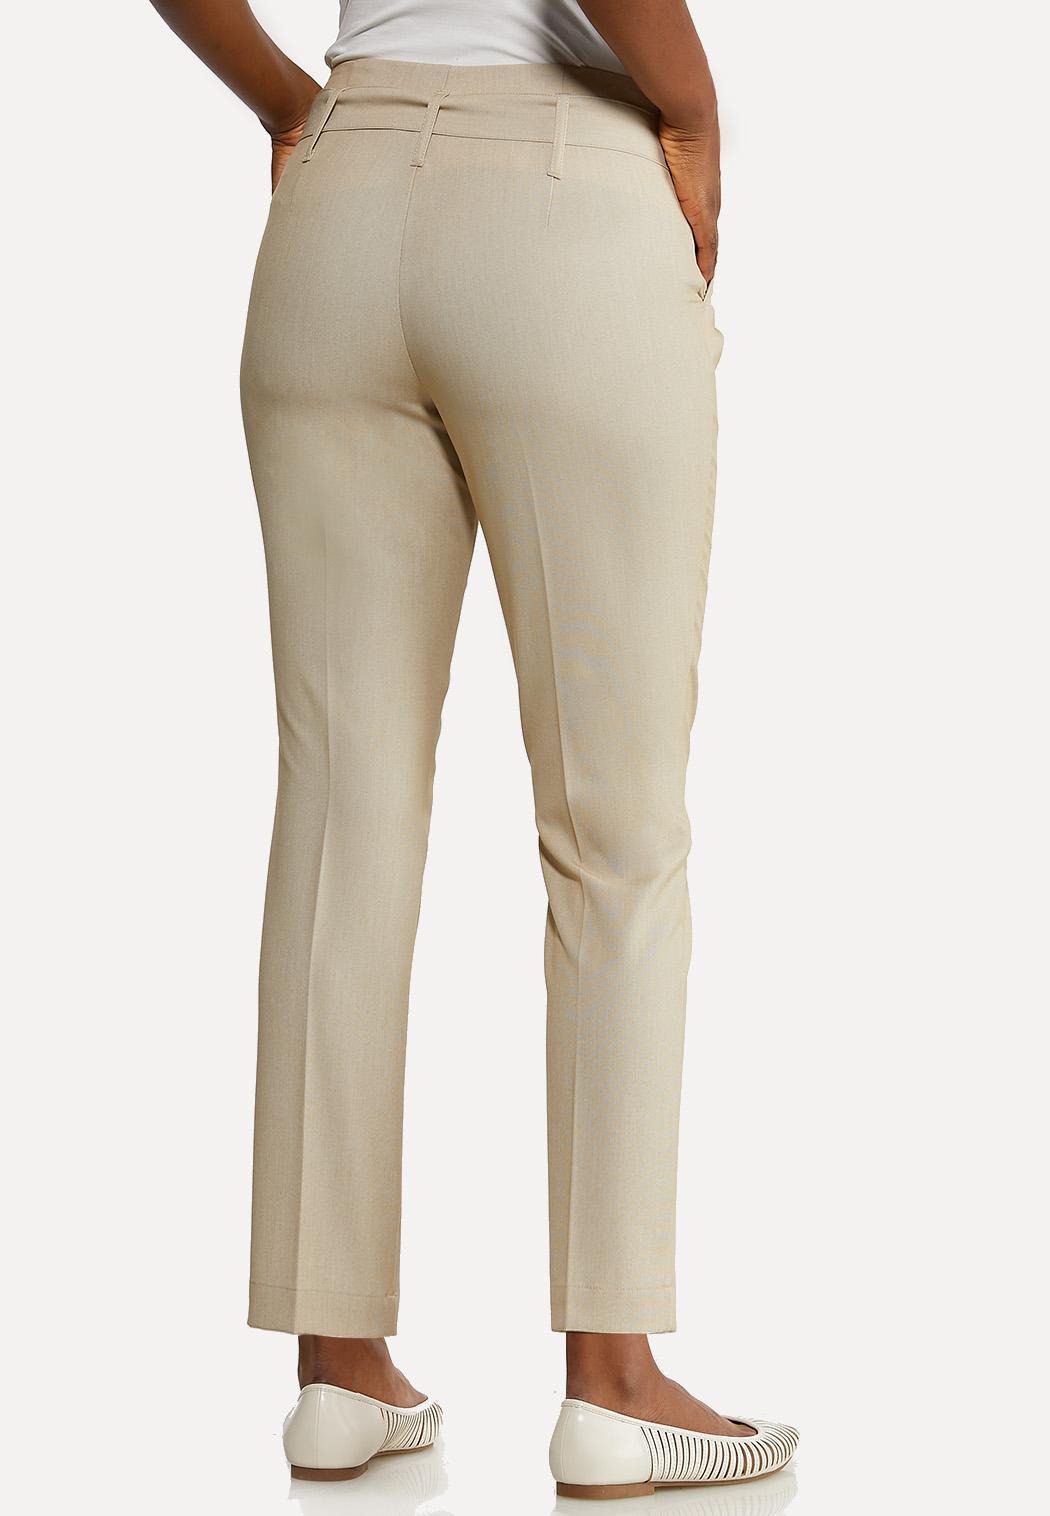 Paperbag Trousers (Item #44184812)